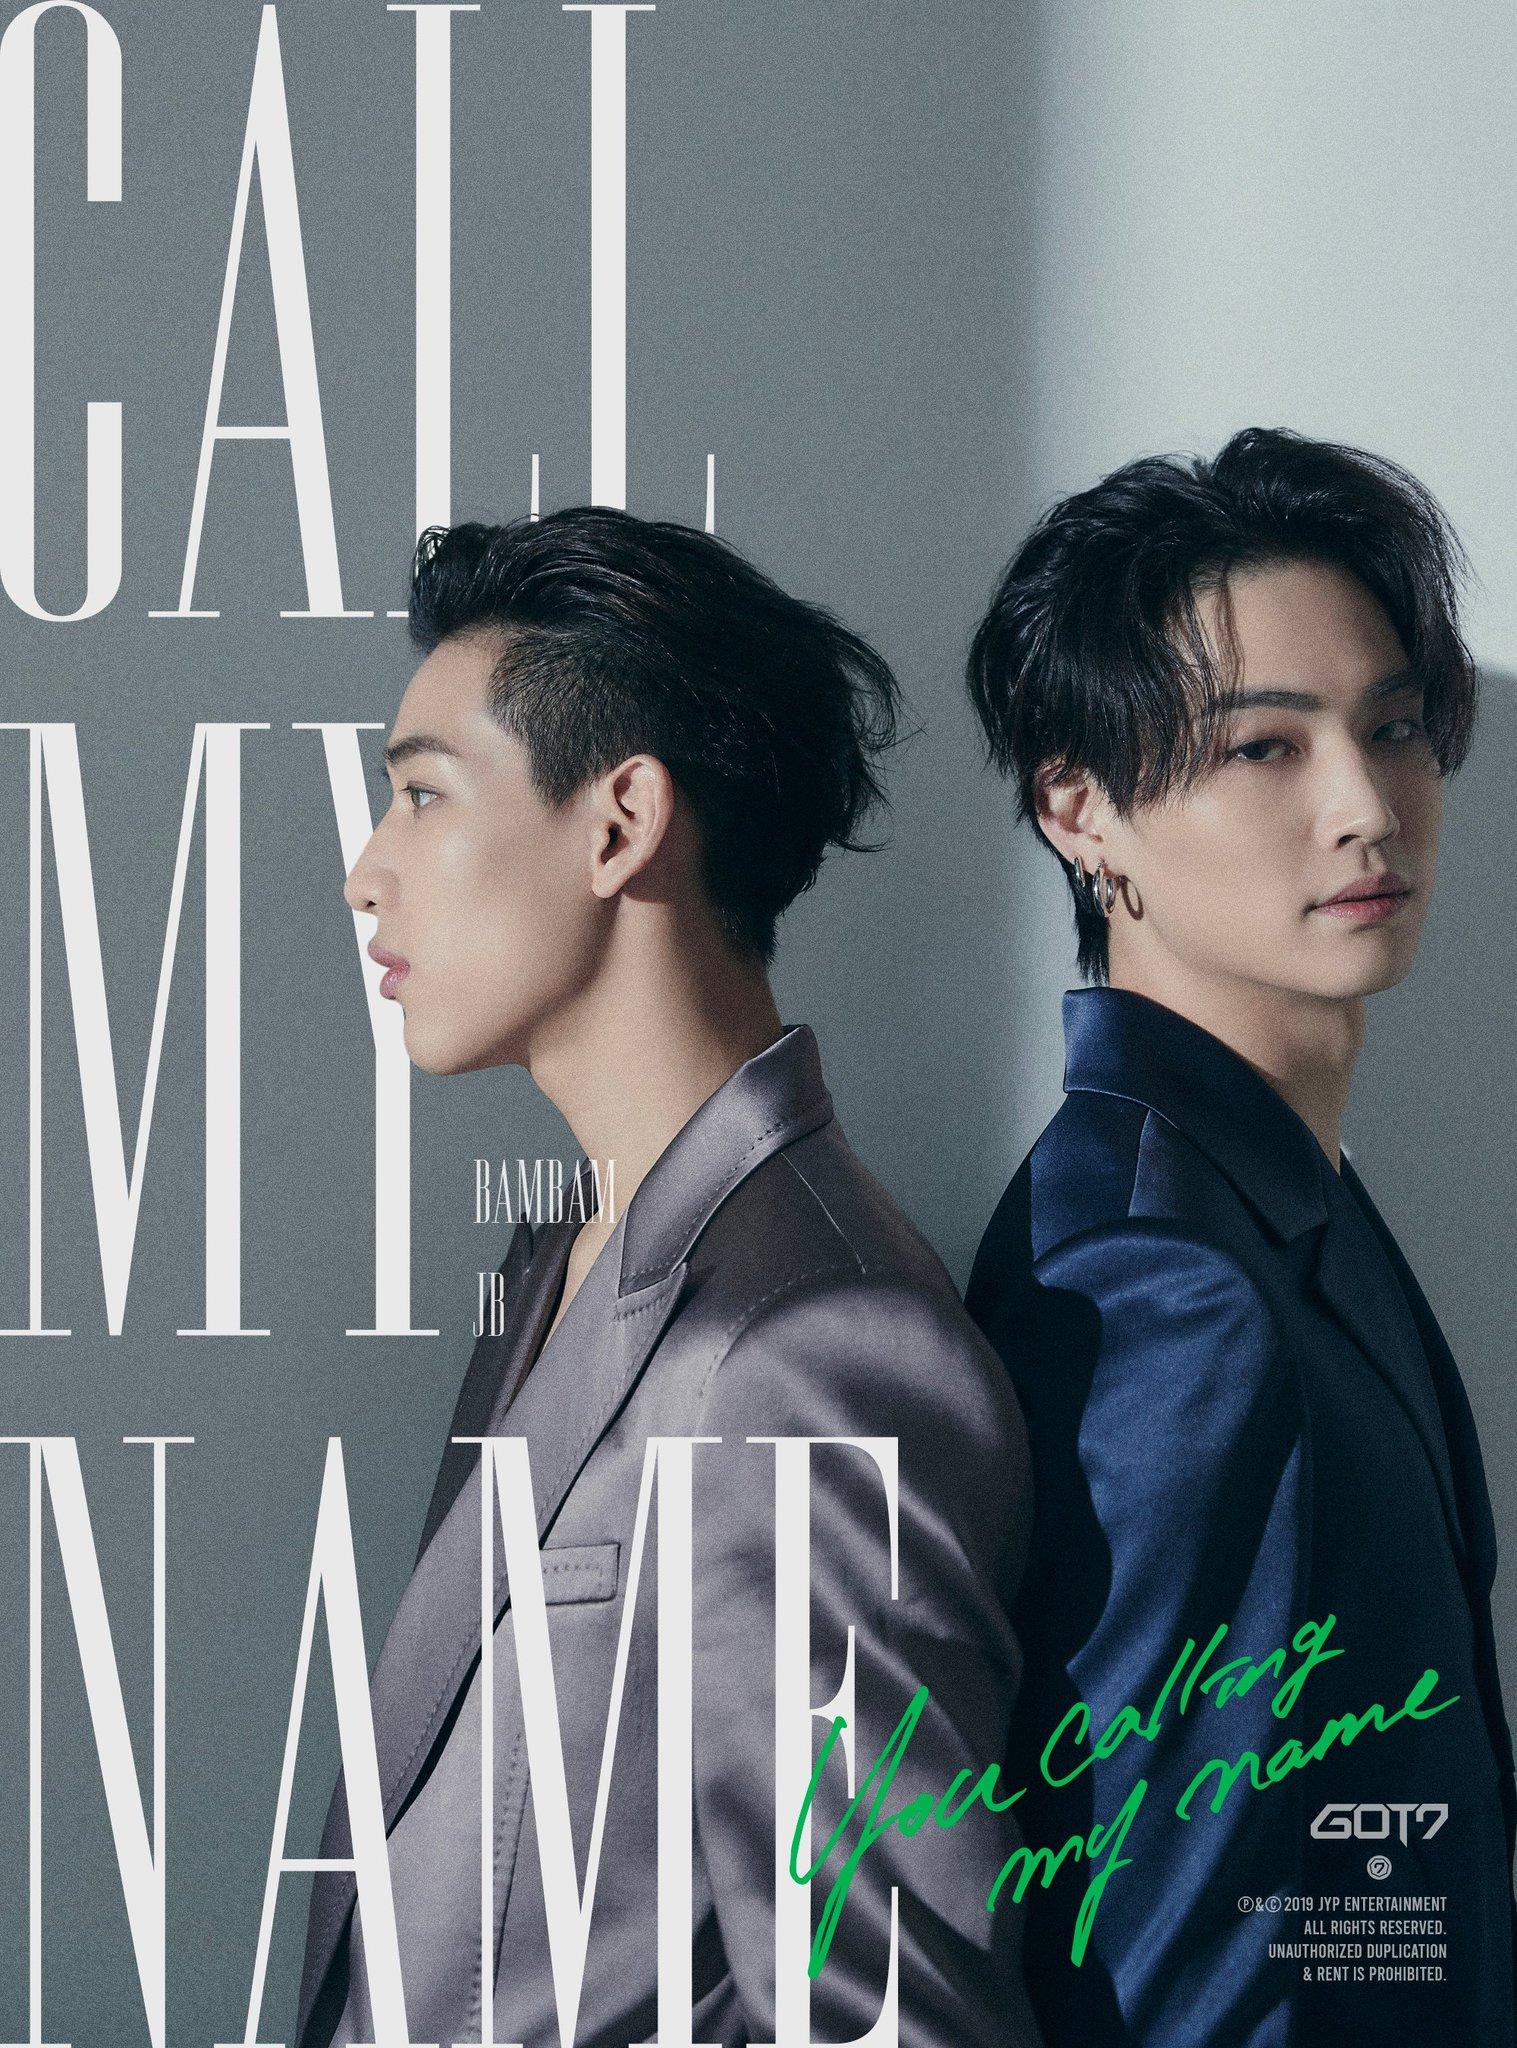 Call My Name - GOT7 Wallpaper (43068832